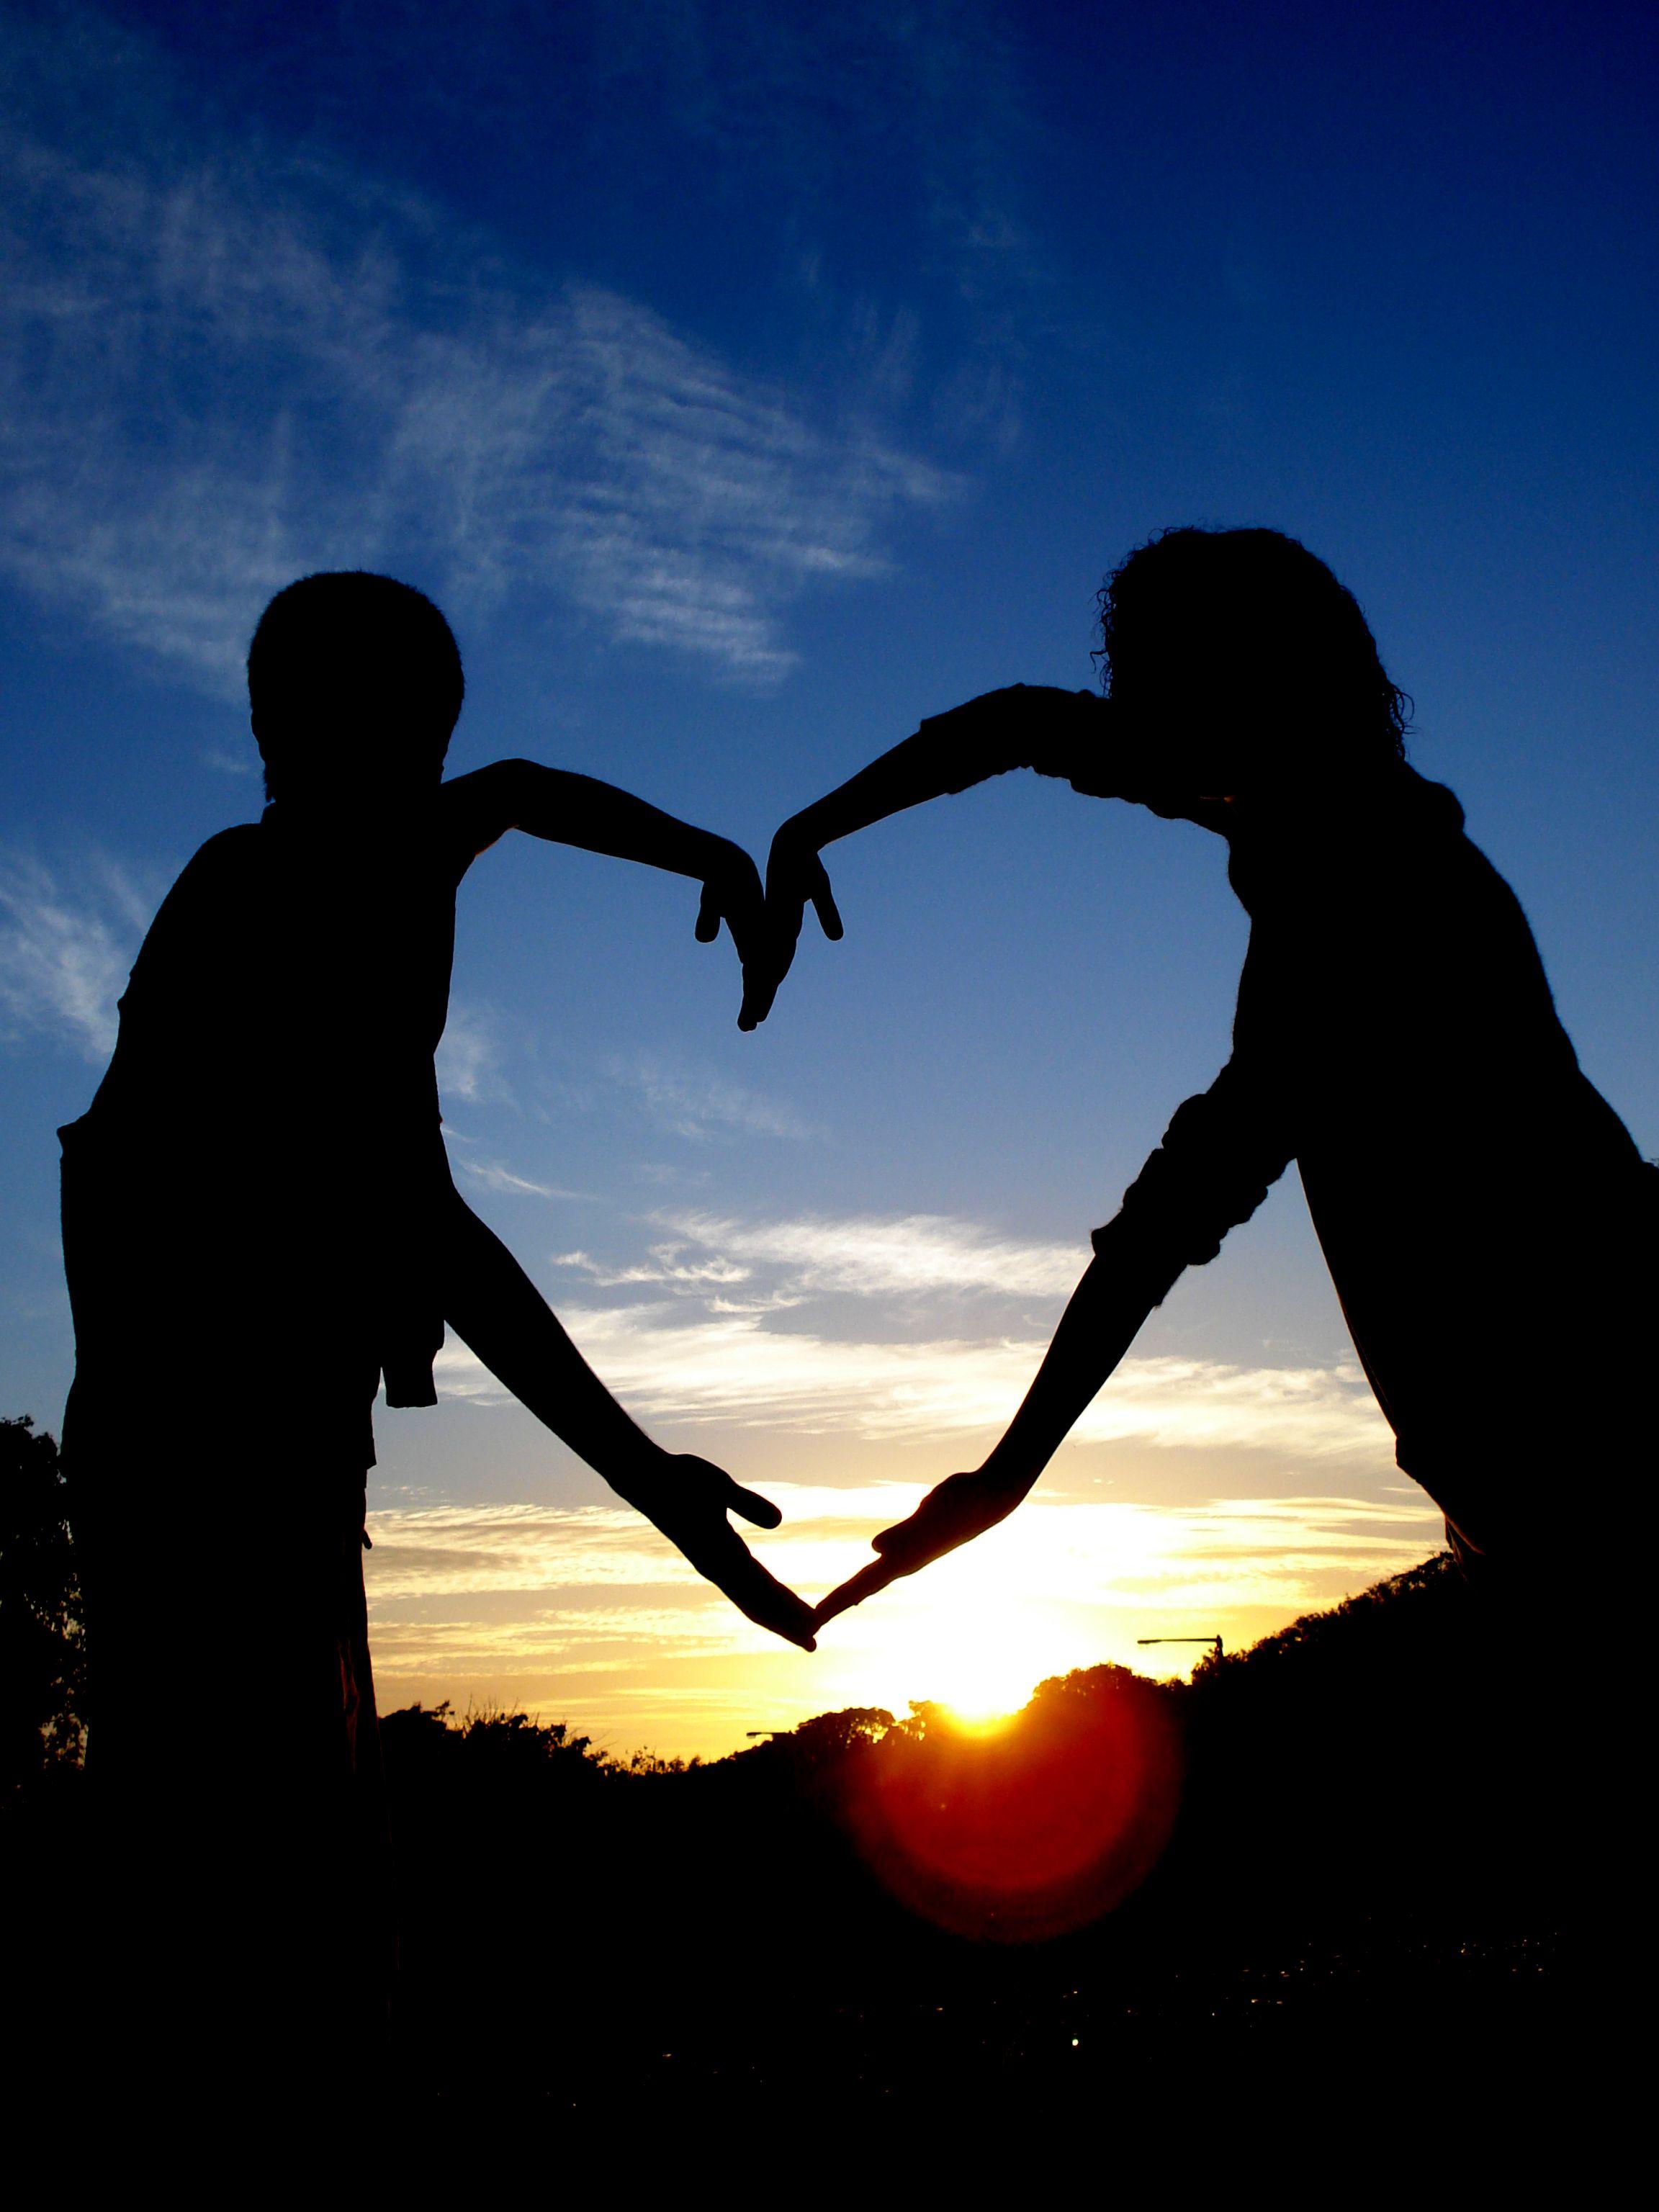 iubeste-i_pe_ceilalti_www.fiimplinit.ro